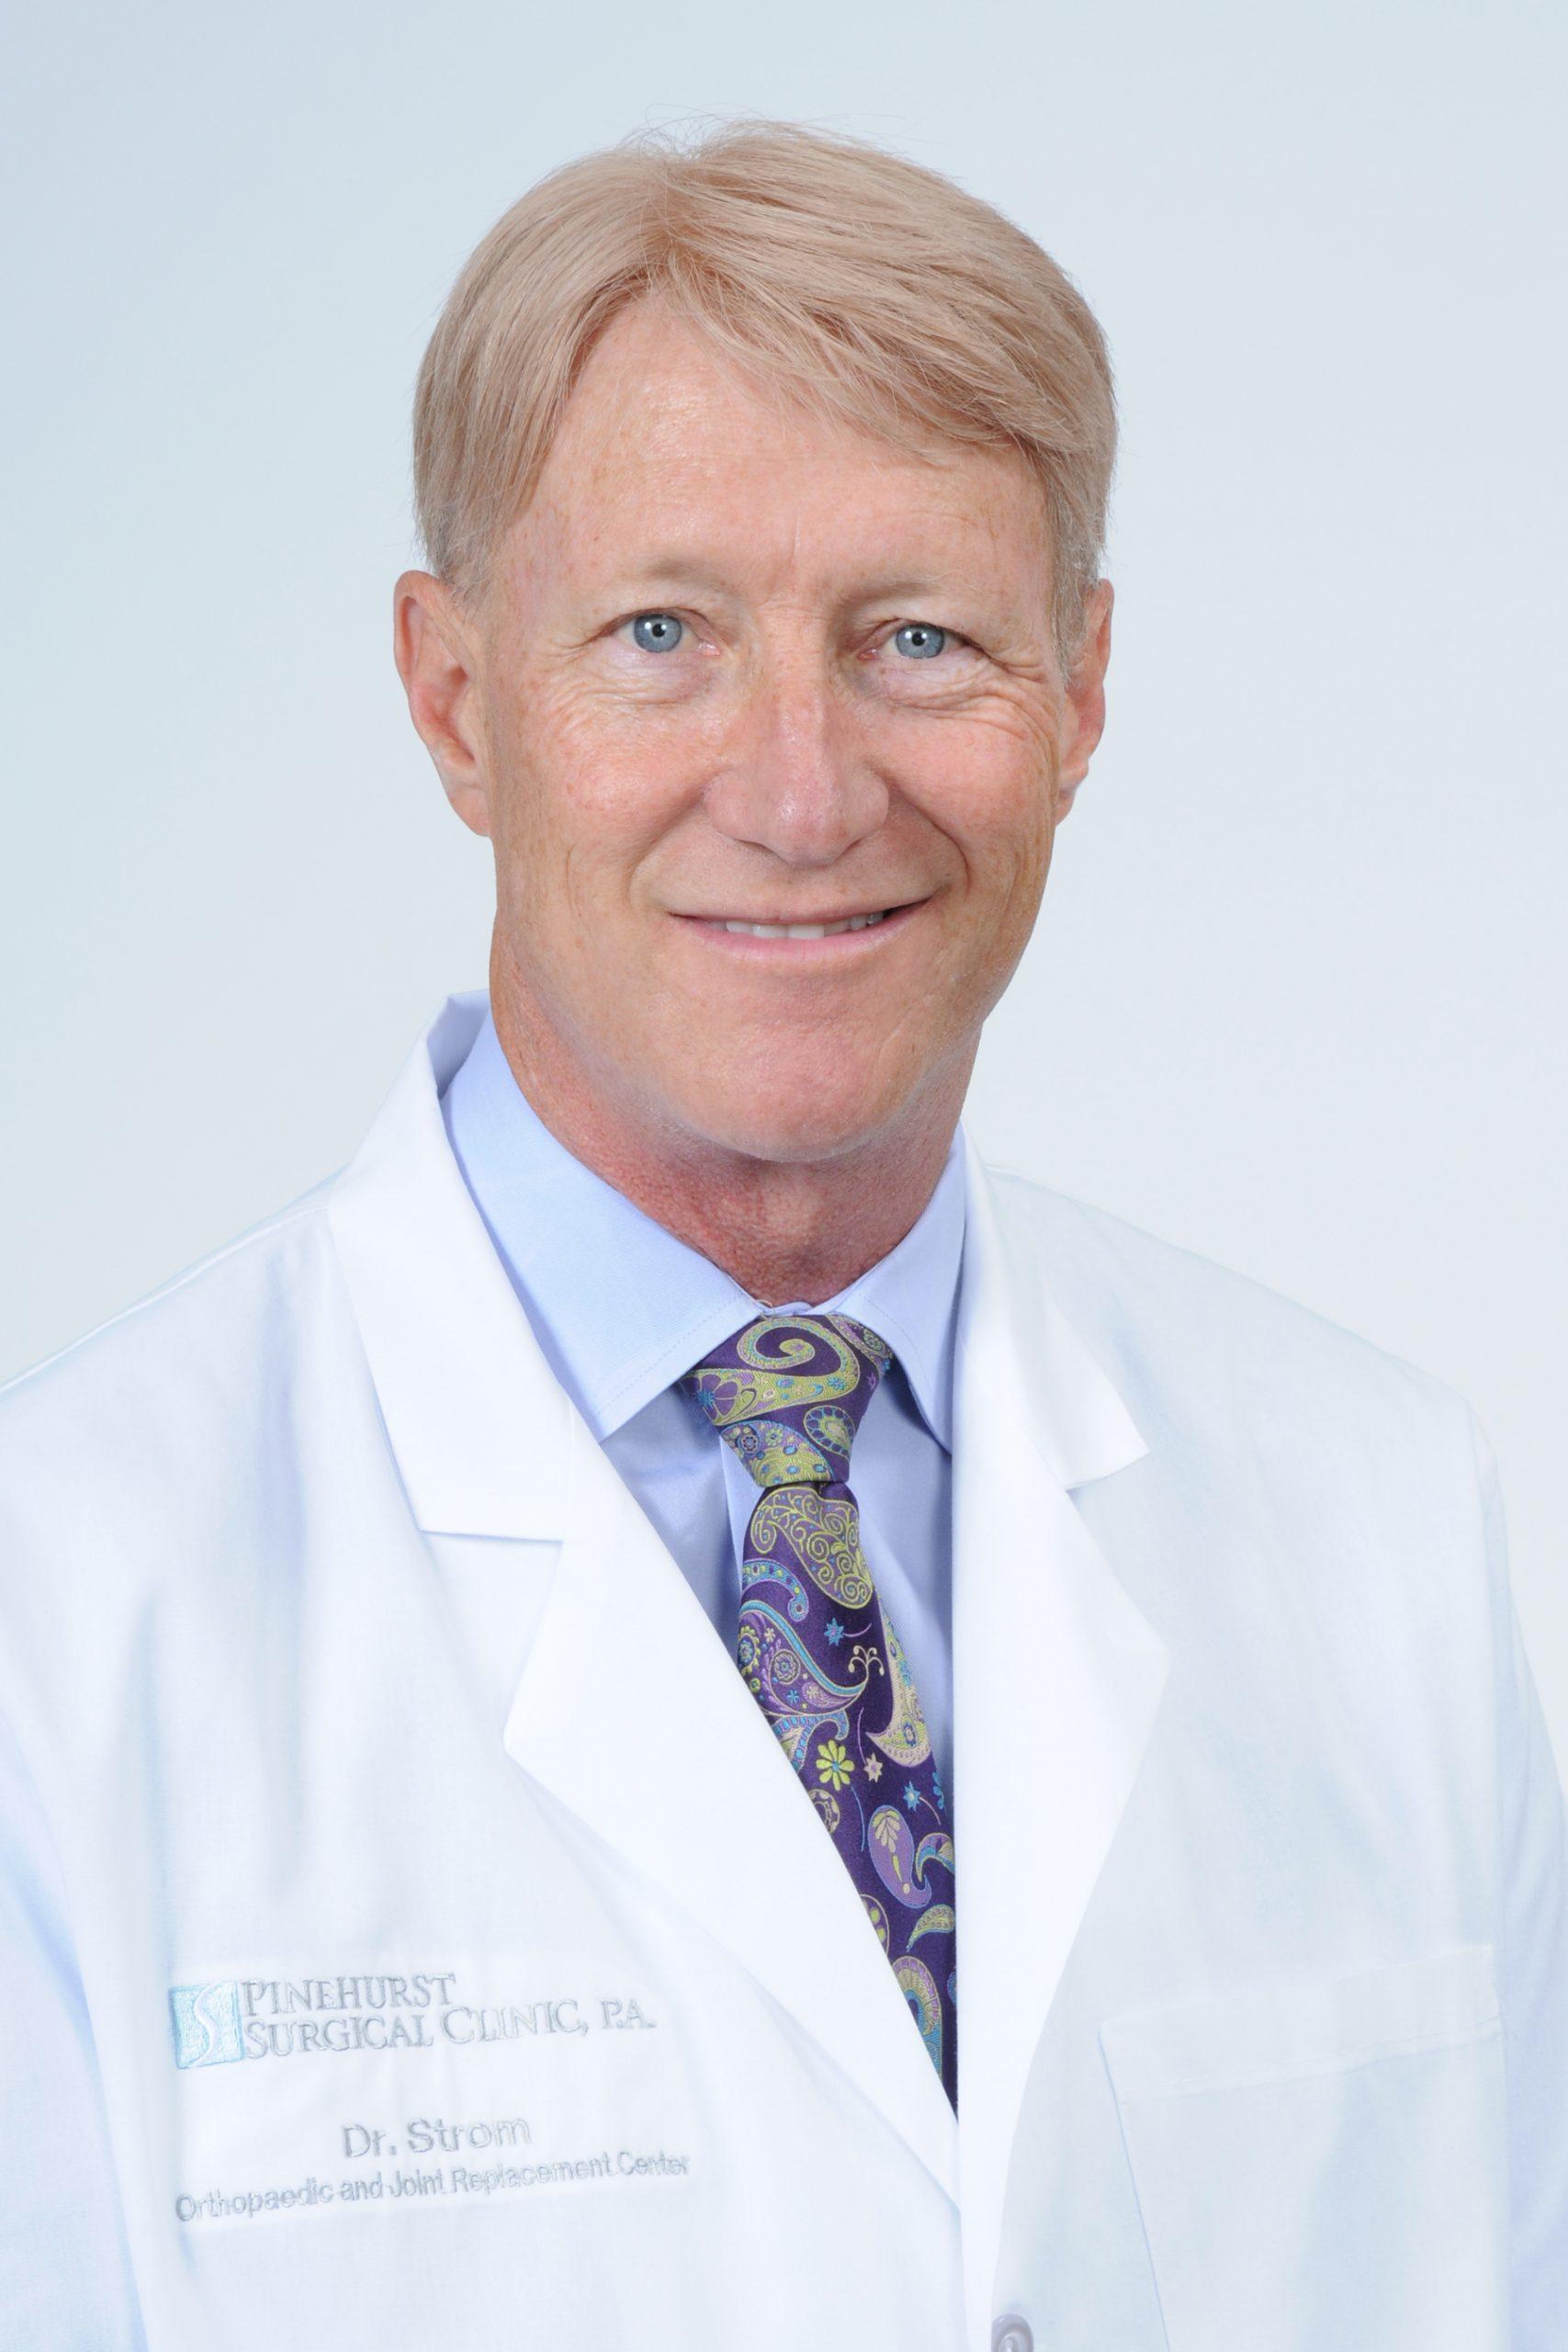 David Strom Orthopaedic Surgery